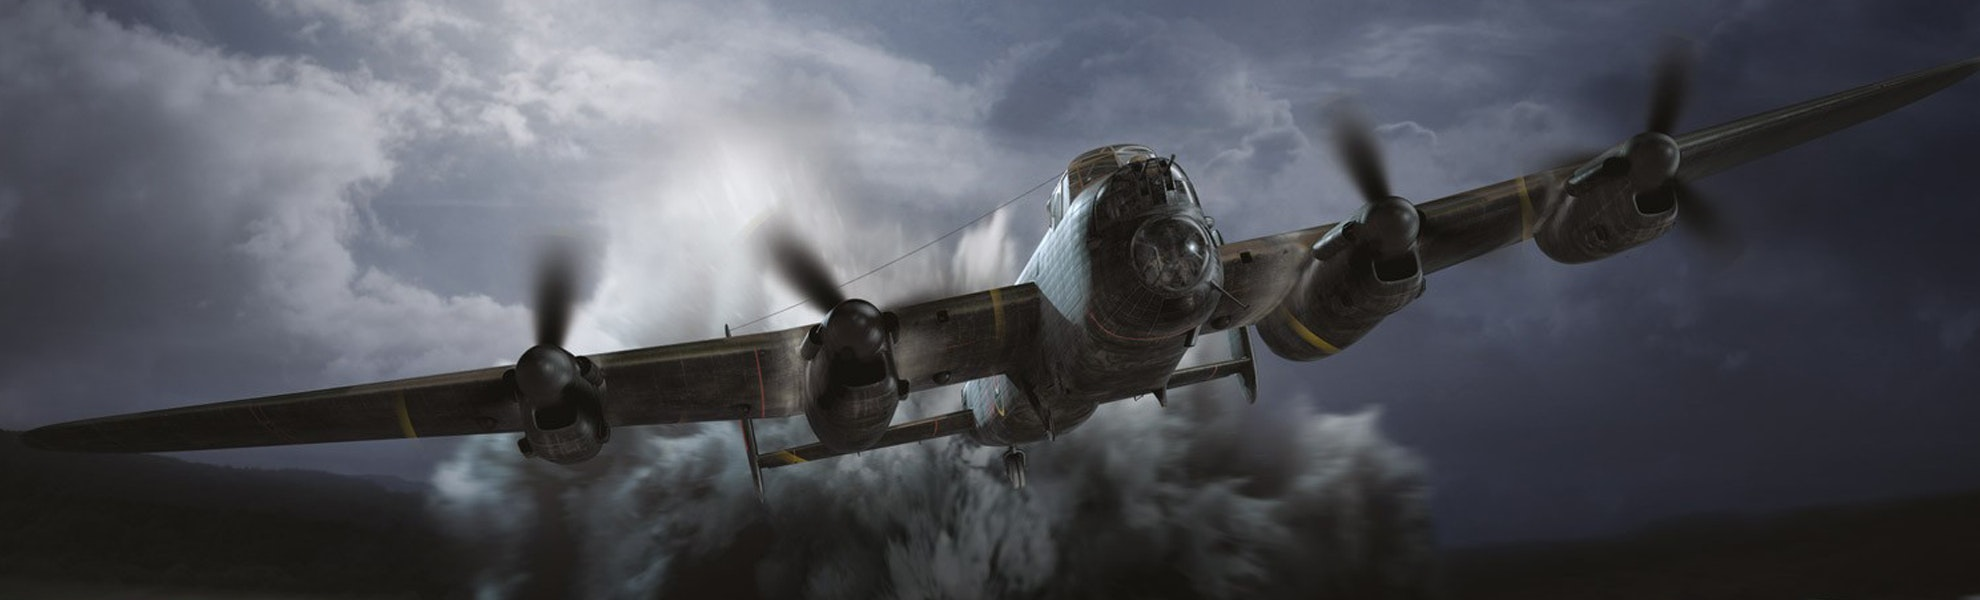 Airfix Lancaster 1: 72-Scale Dambusters Kit